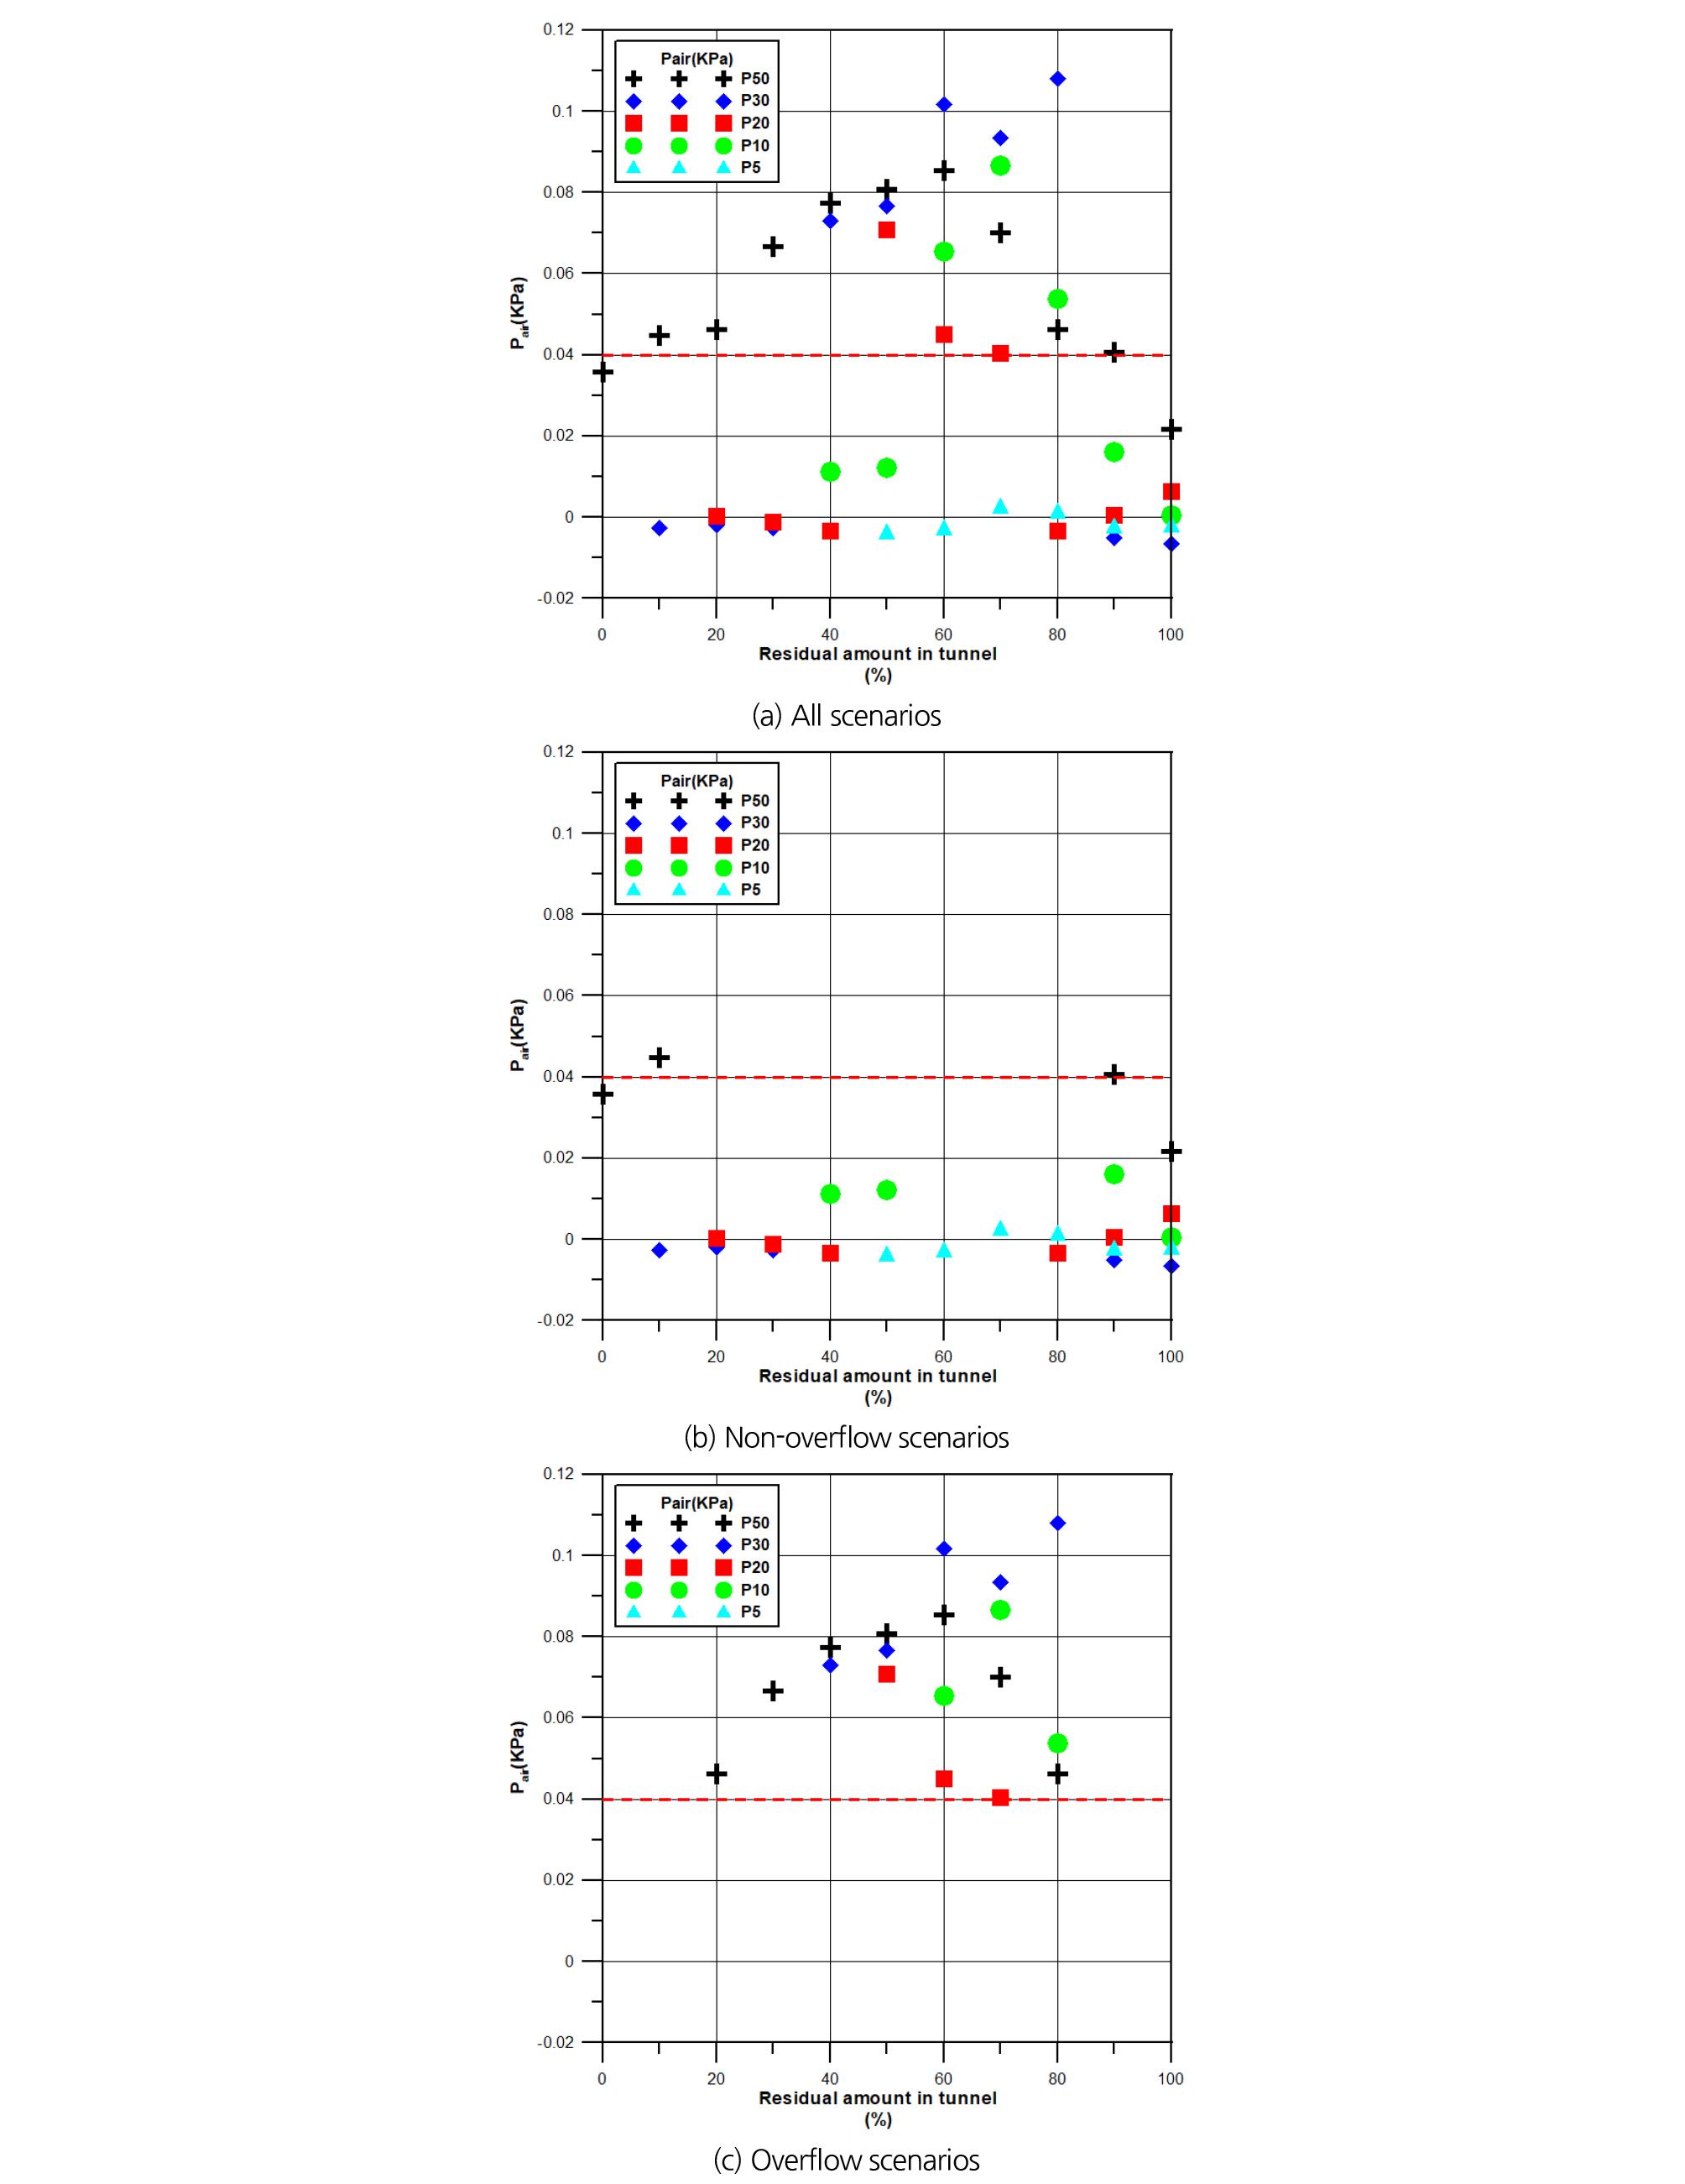 http://static.apub.kr/journalsite/sites/kwra/2020-053-04/N0200530407/images/kwra_53_04_07_F7.jpg